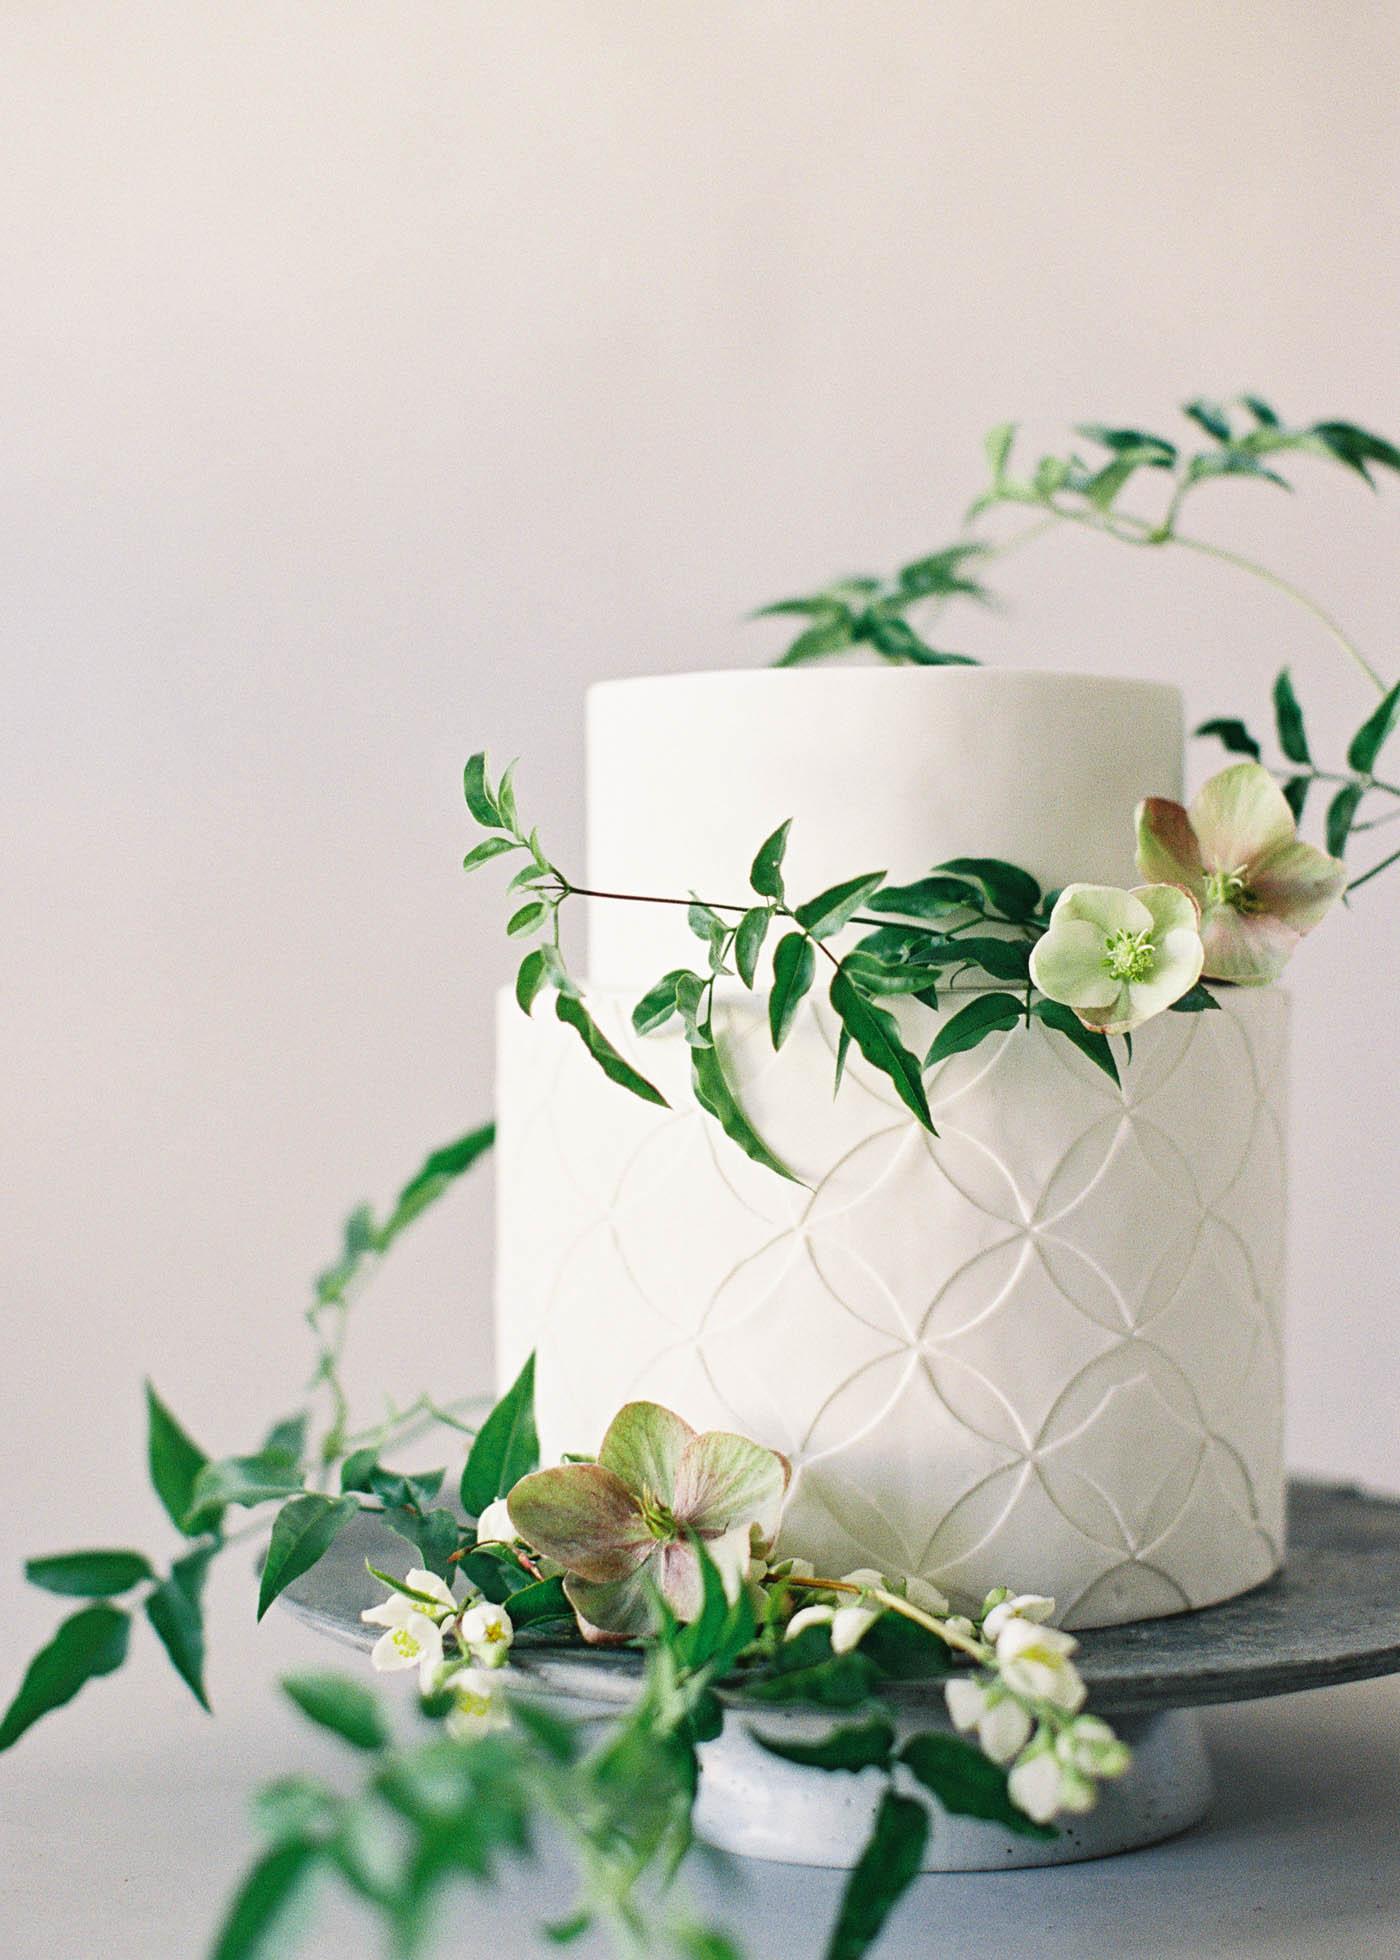 naturalist-cakes-7-Jen_Huang-000486-R1-035-16.jpg